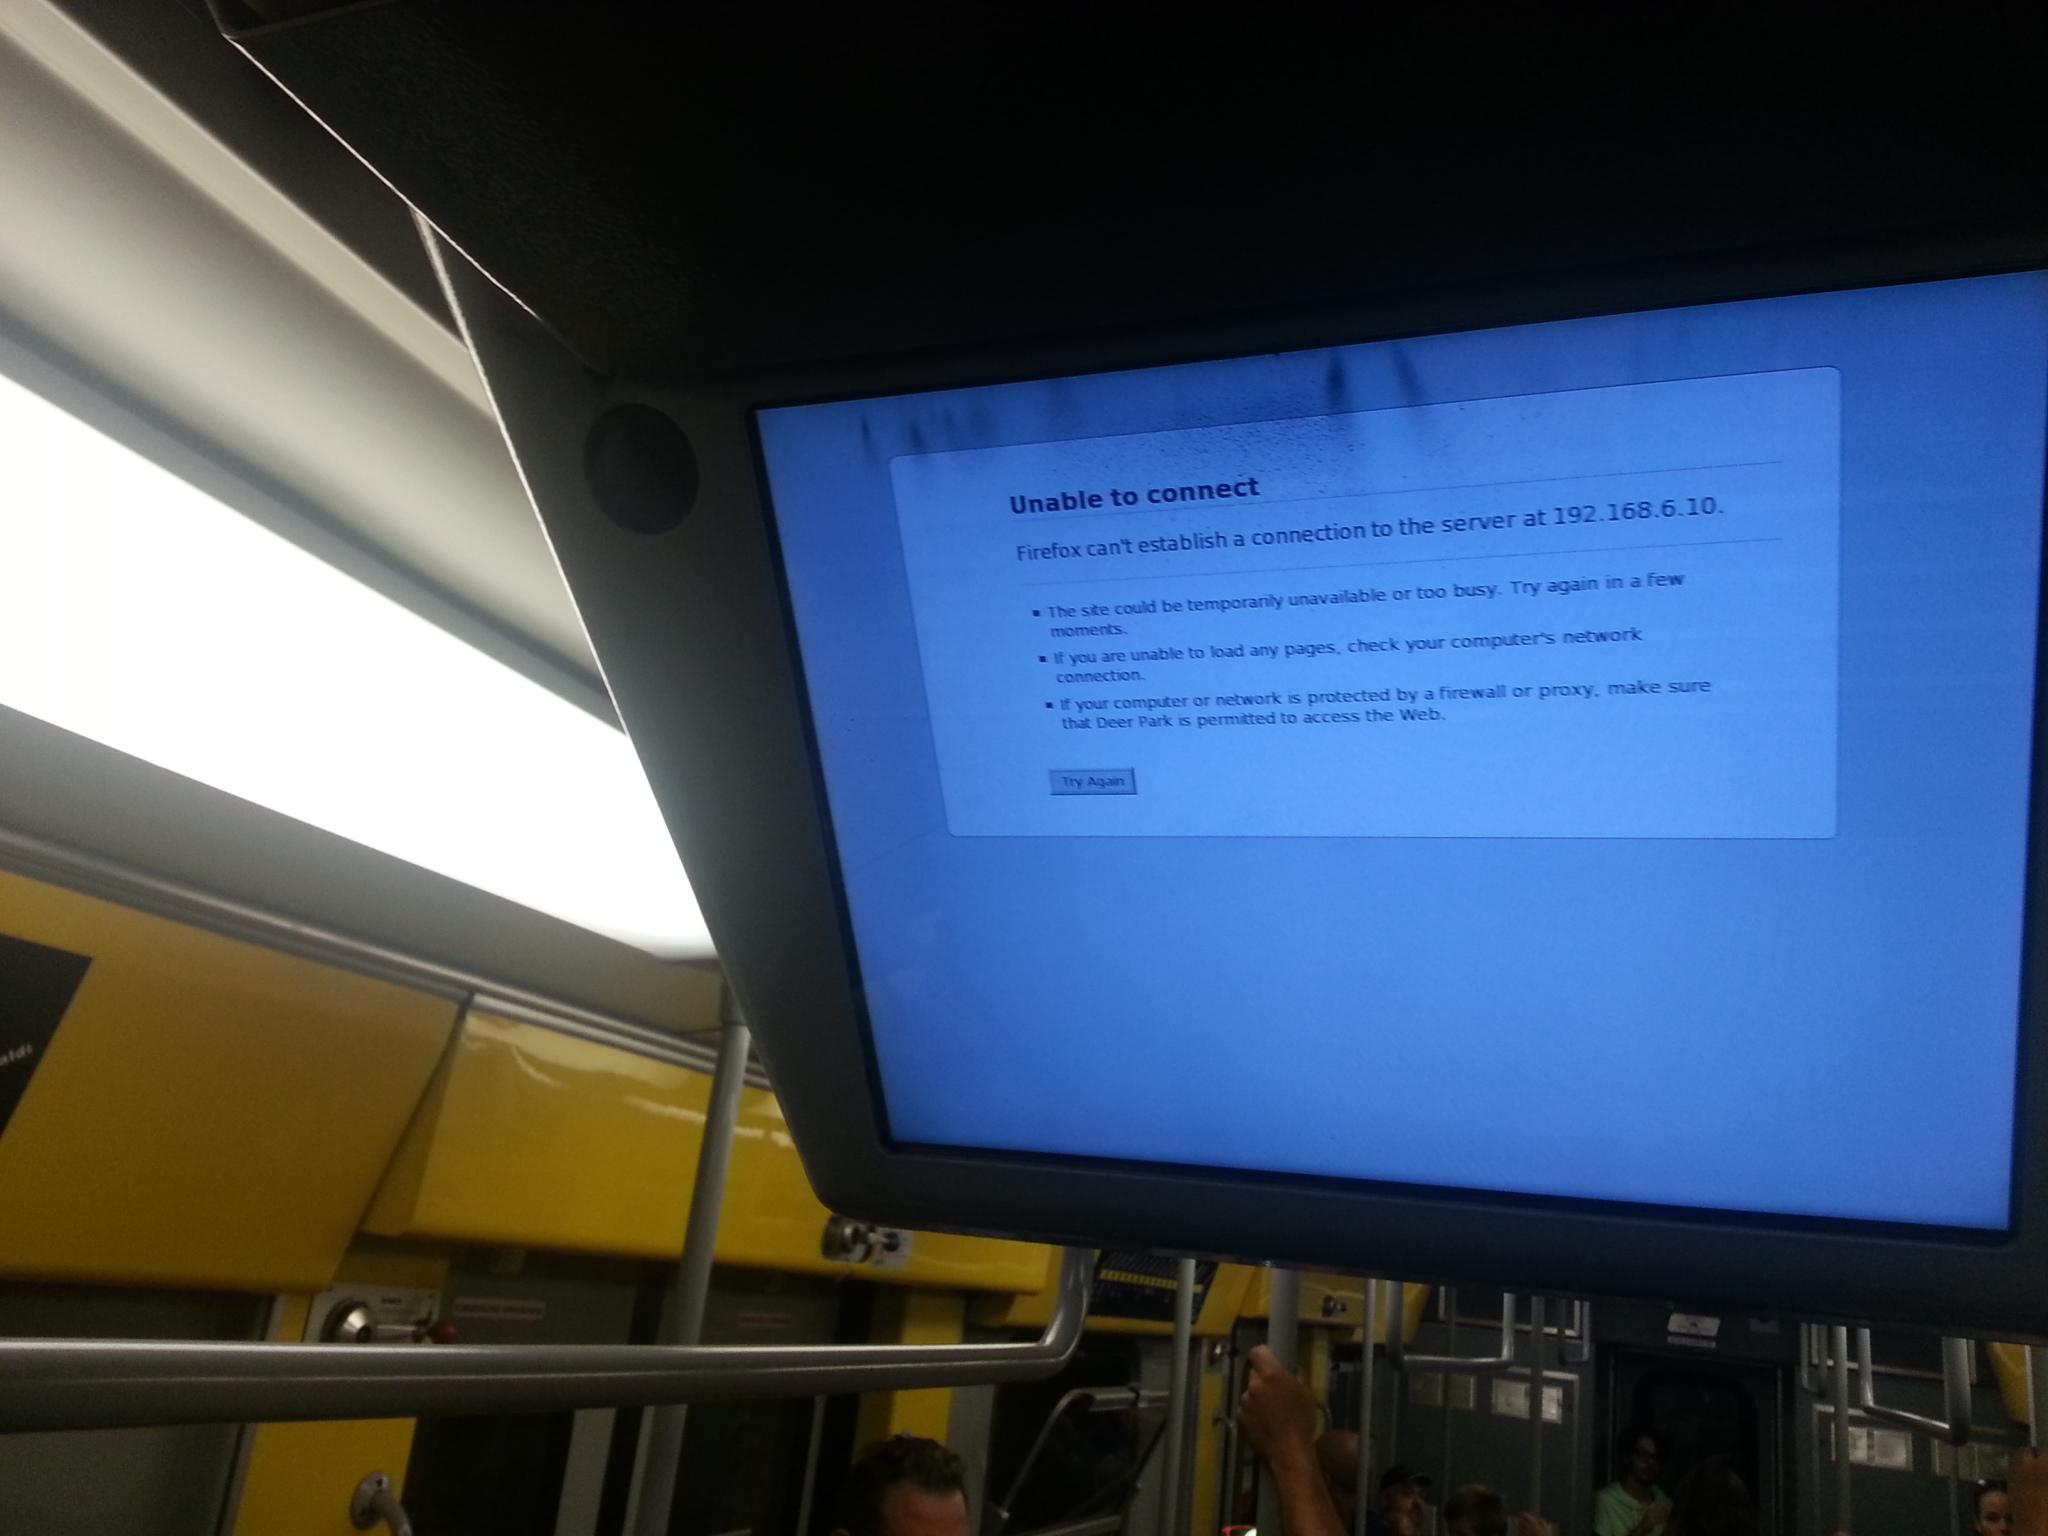 Firefox on Naple's underground. August 2016.